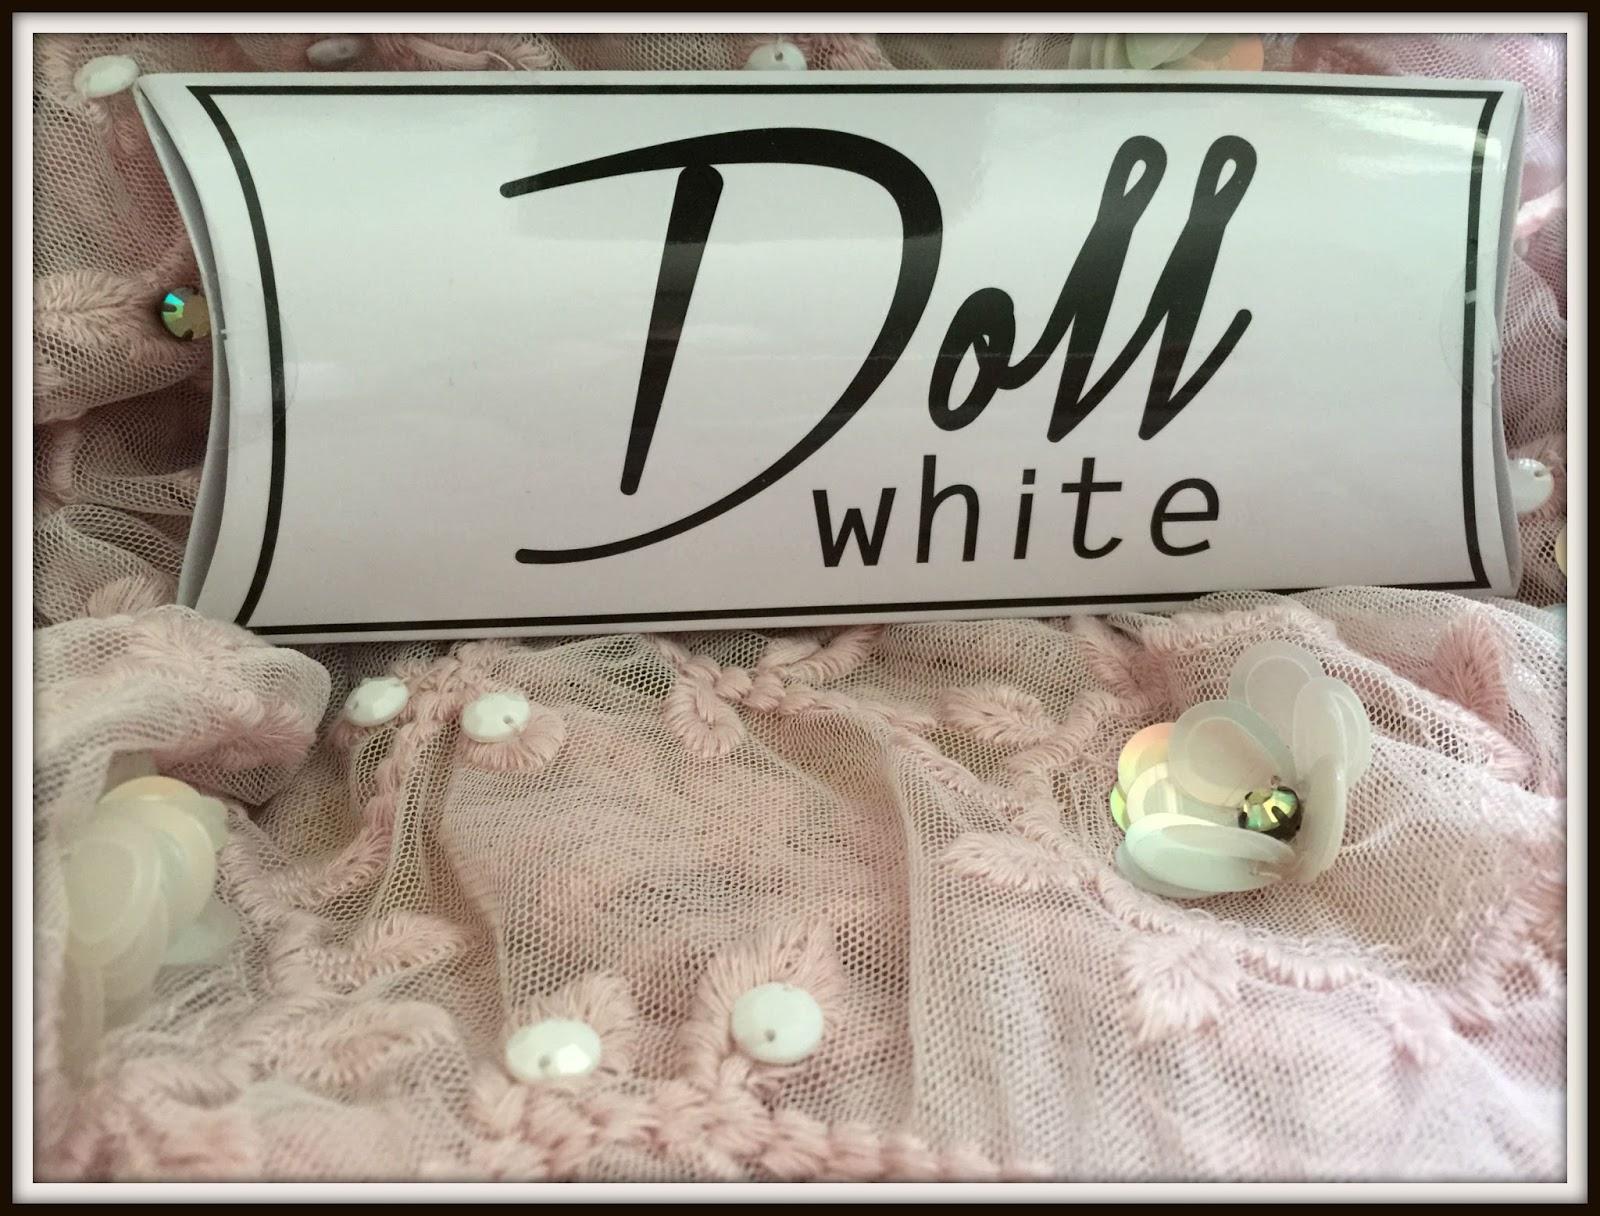 doll white teeth whitening strips